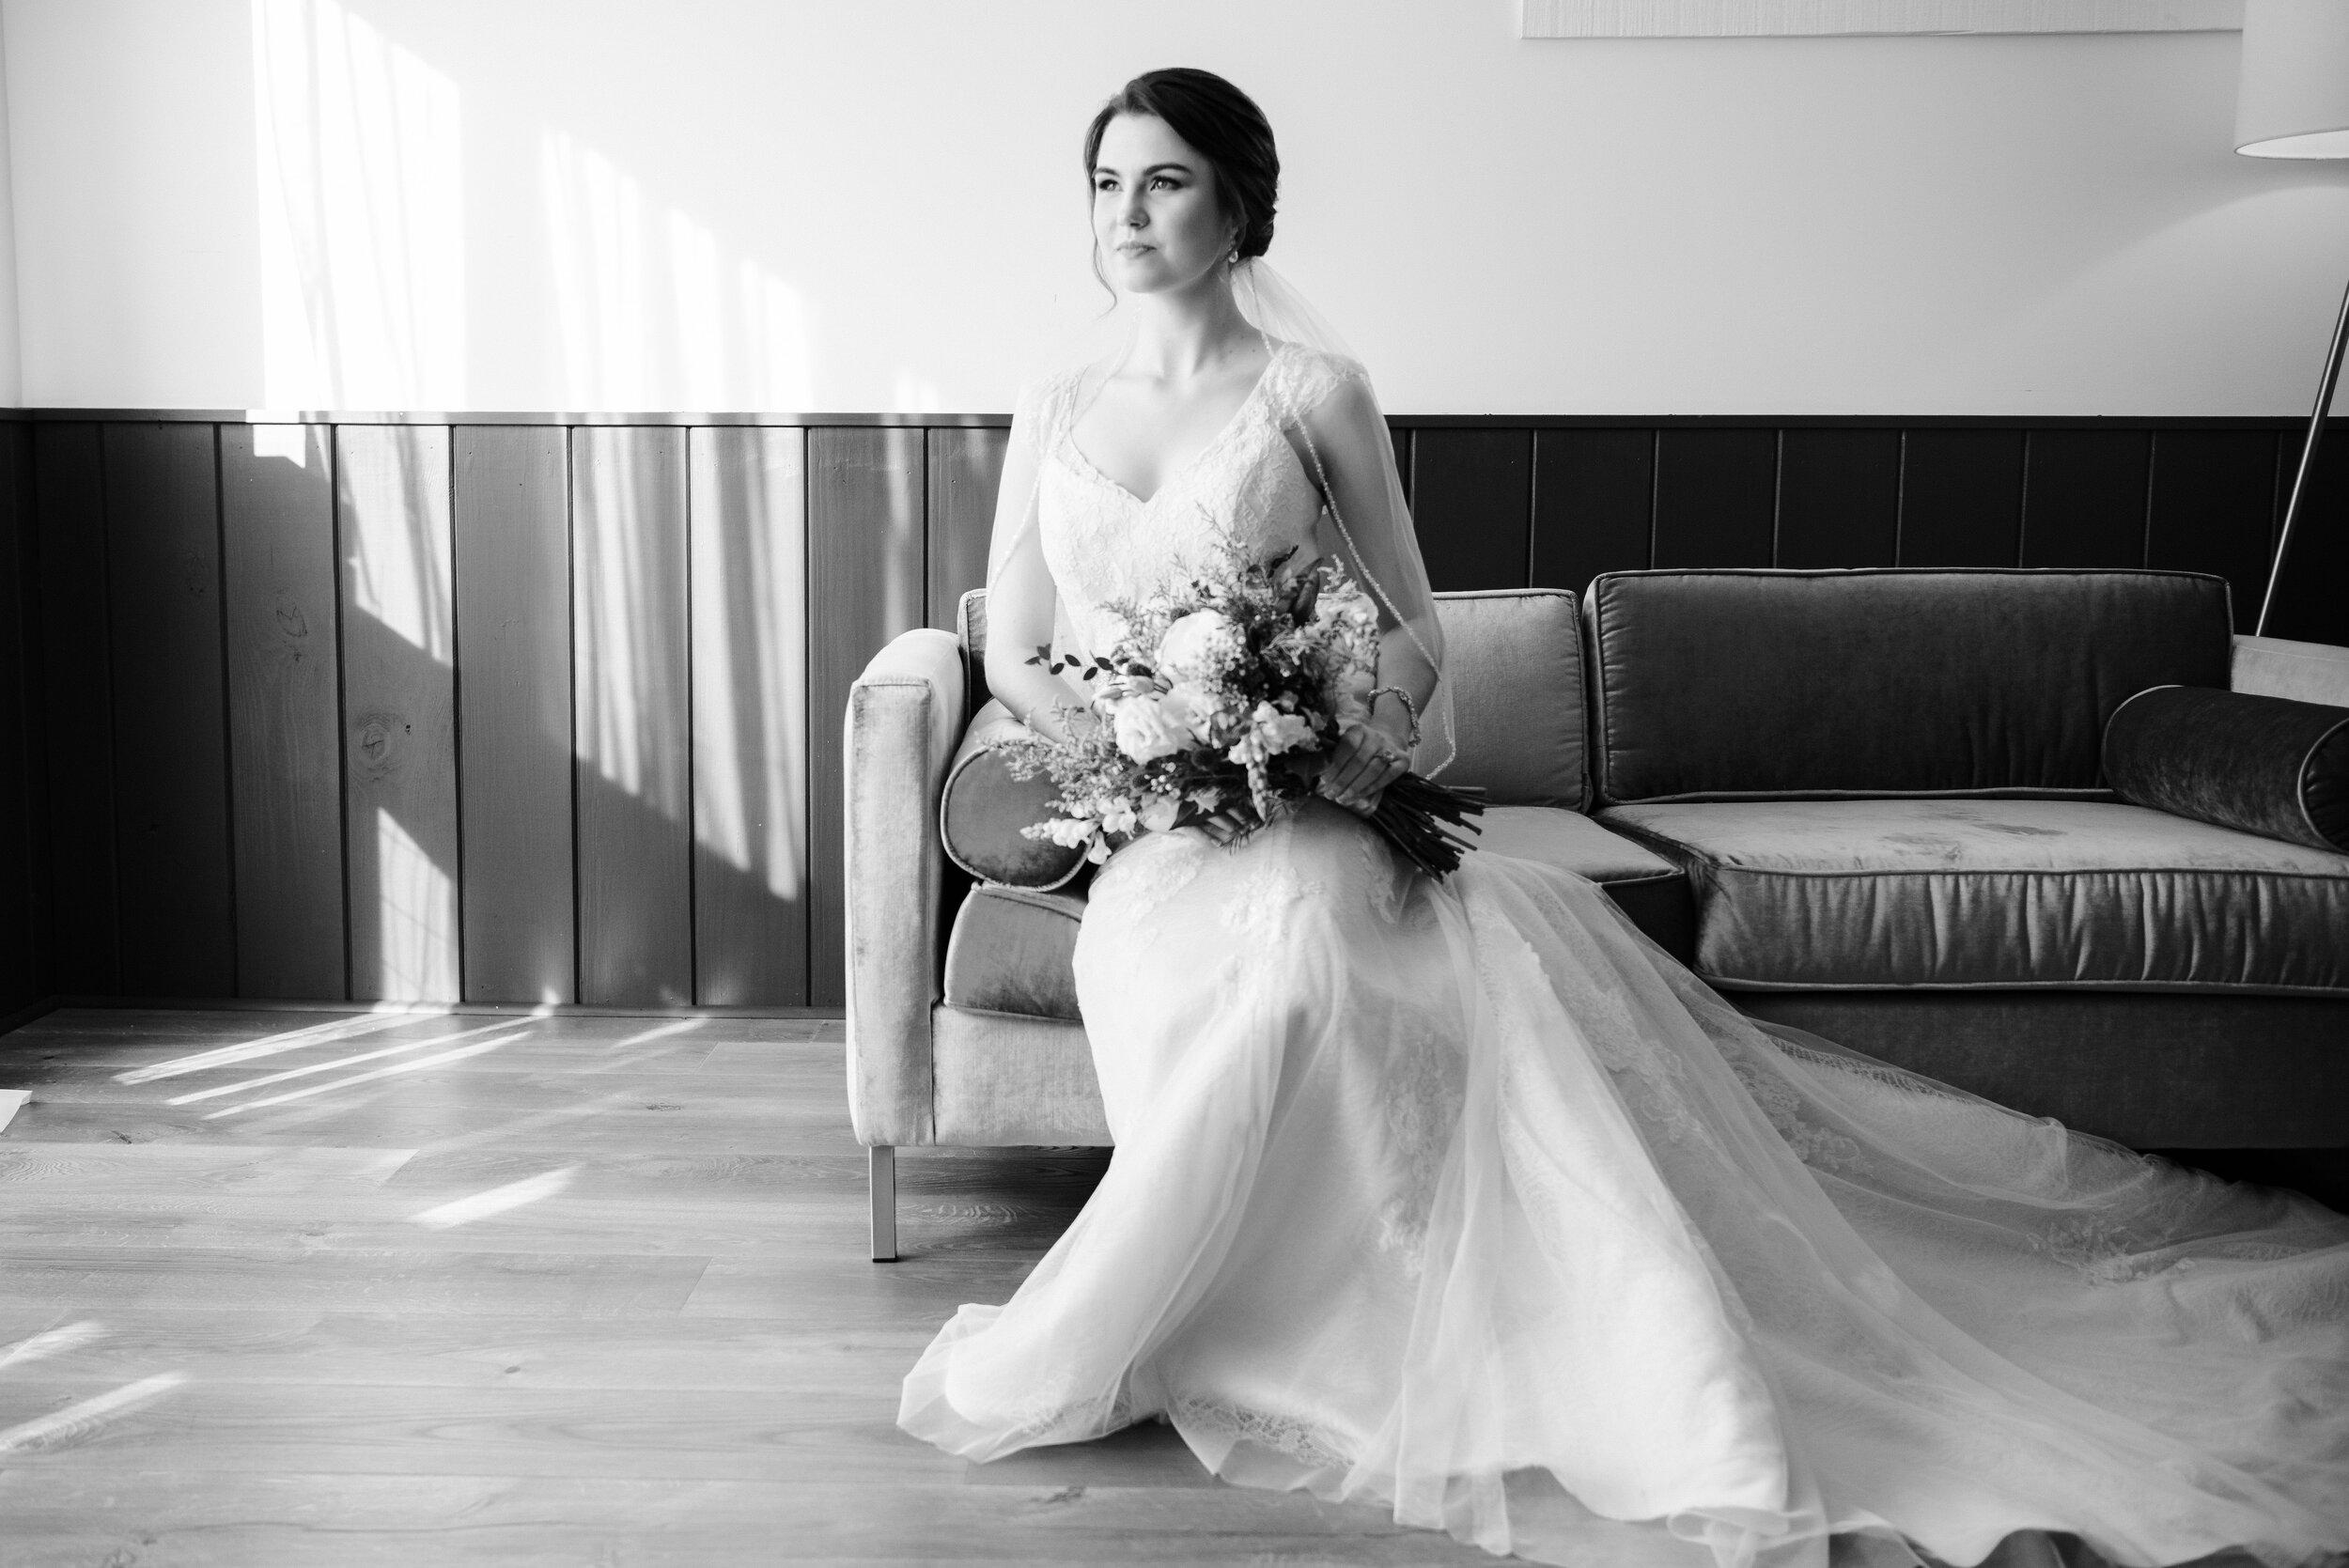 PHOTOGRAPHER: Adrea Thomas Photography -- www.adreathomas.com -- IG: adreathomasphoto  MODELS: Julia —IG: julesblairr